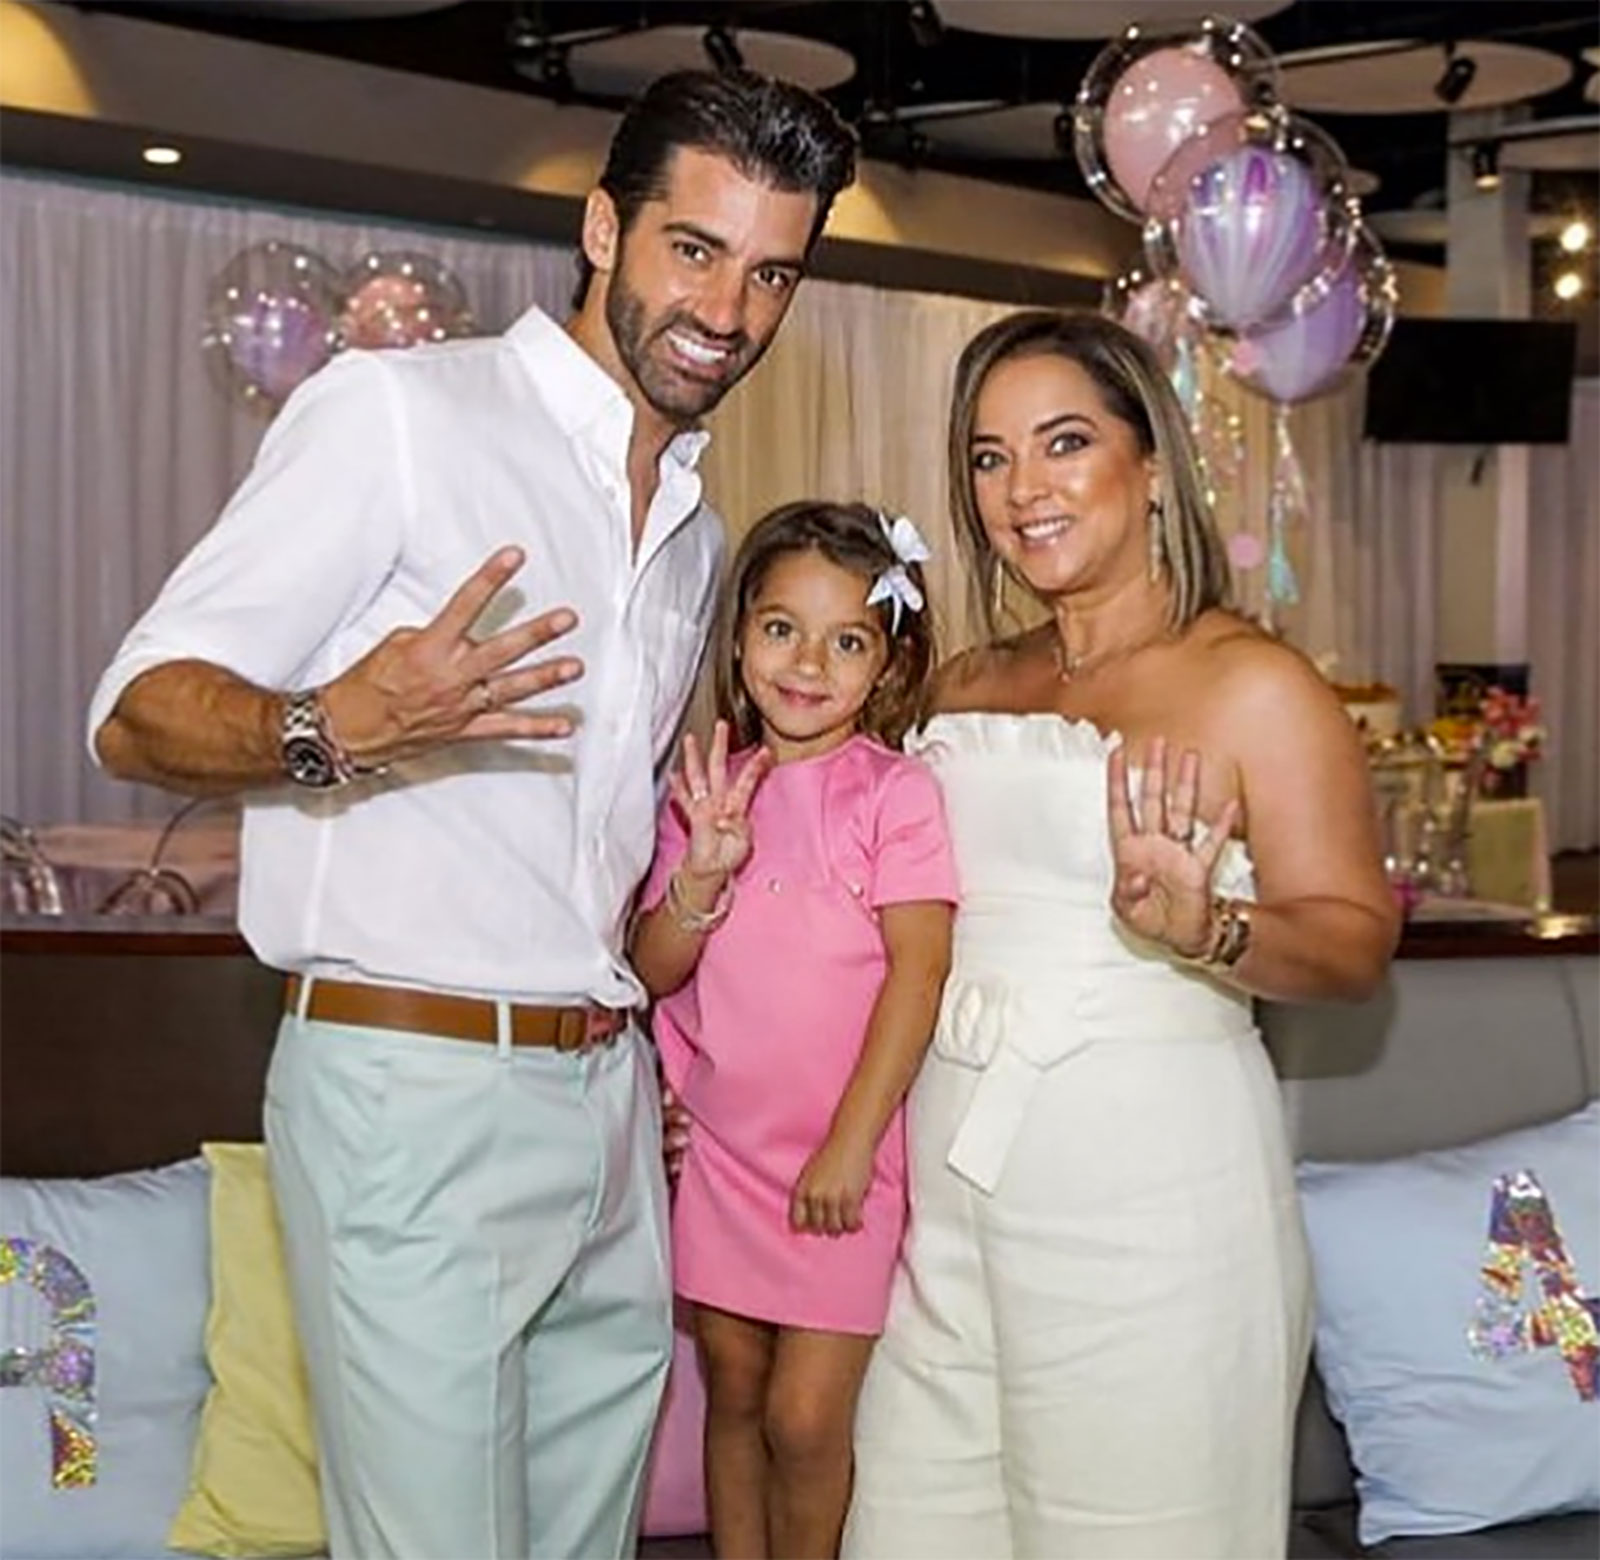 Alaïa Costa, Adamari López, Toni Costa